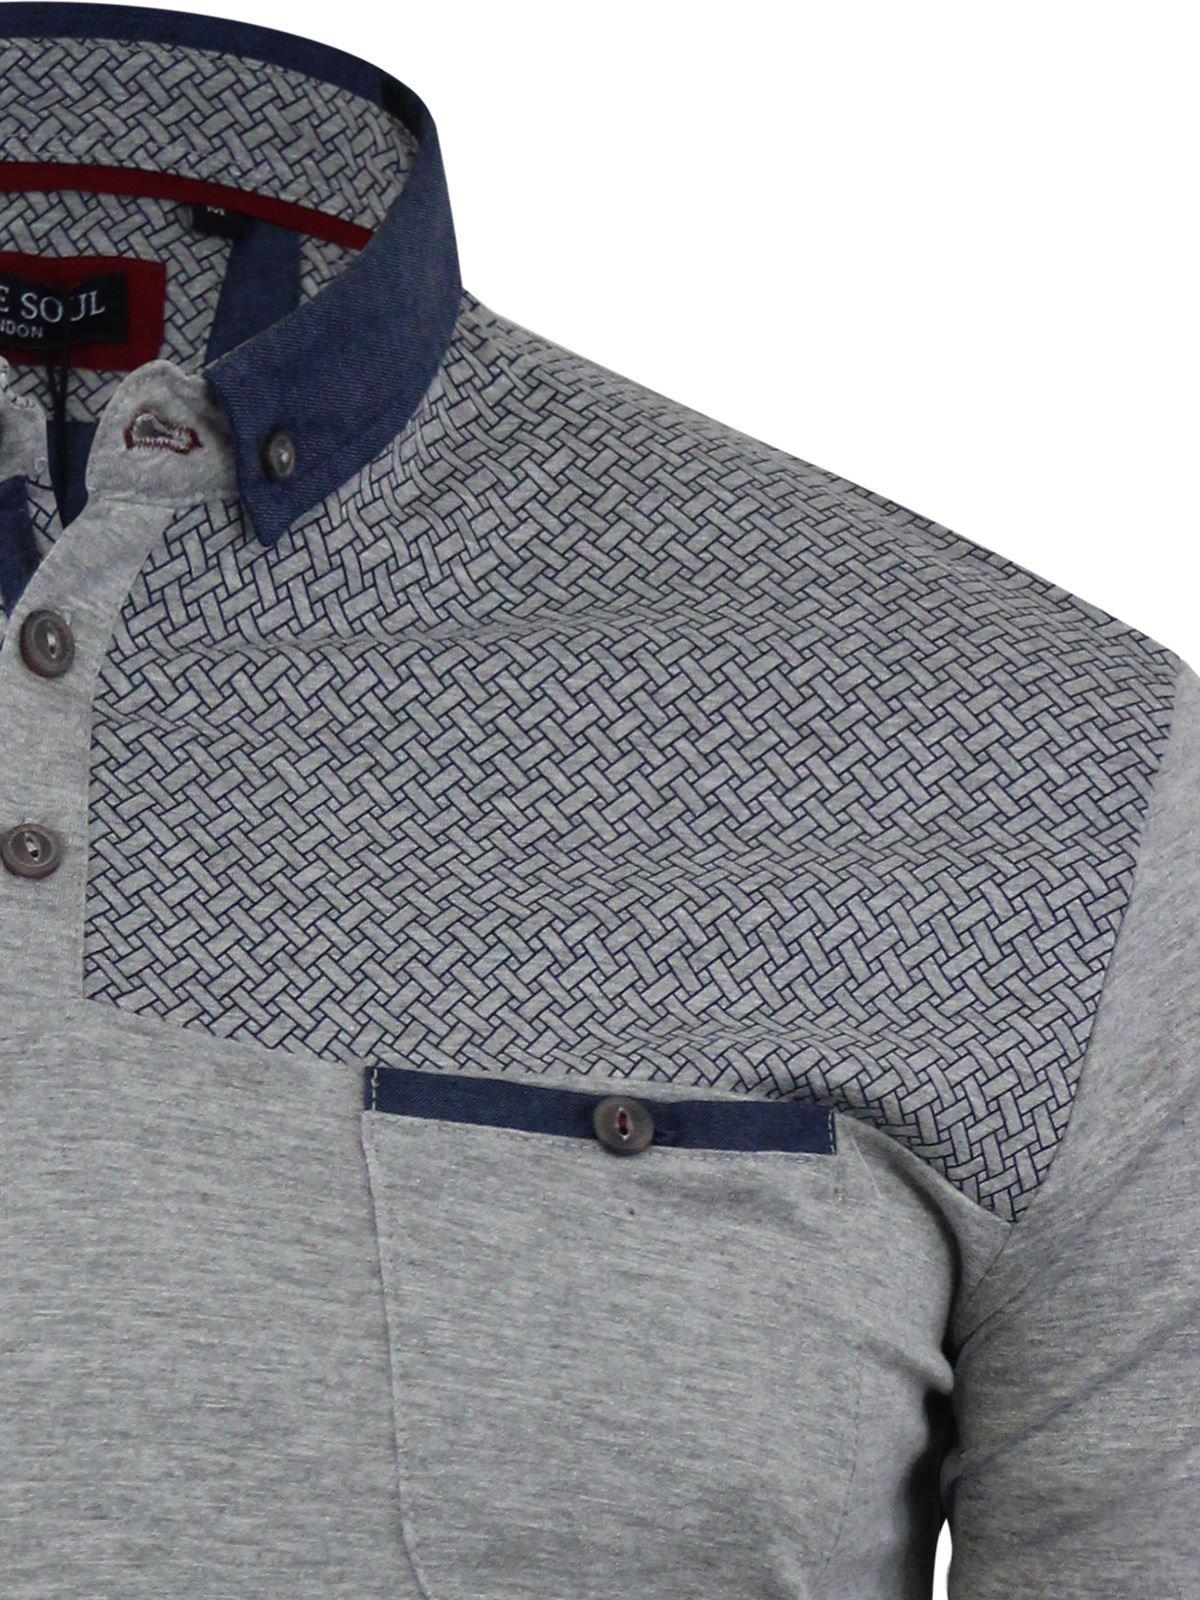 Mens-Polo-T-Shirt-Brave-Soul-Aqua-Printed-Short-Sleeve-Chambray-Collar-Top thumbnail 7